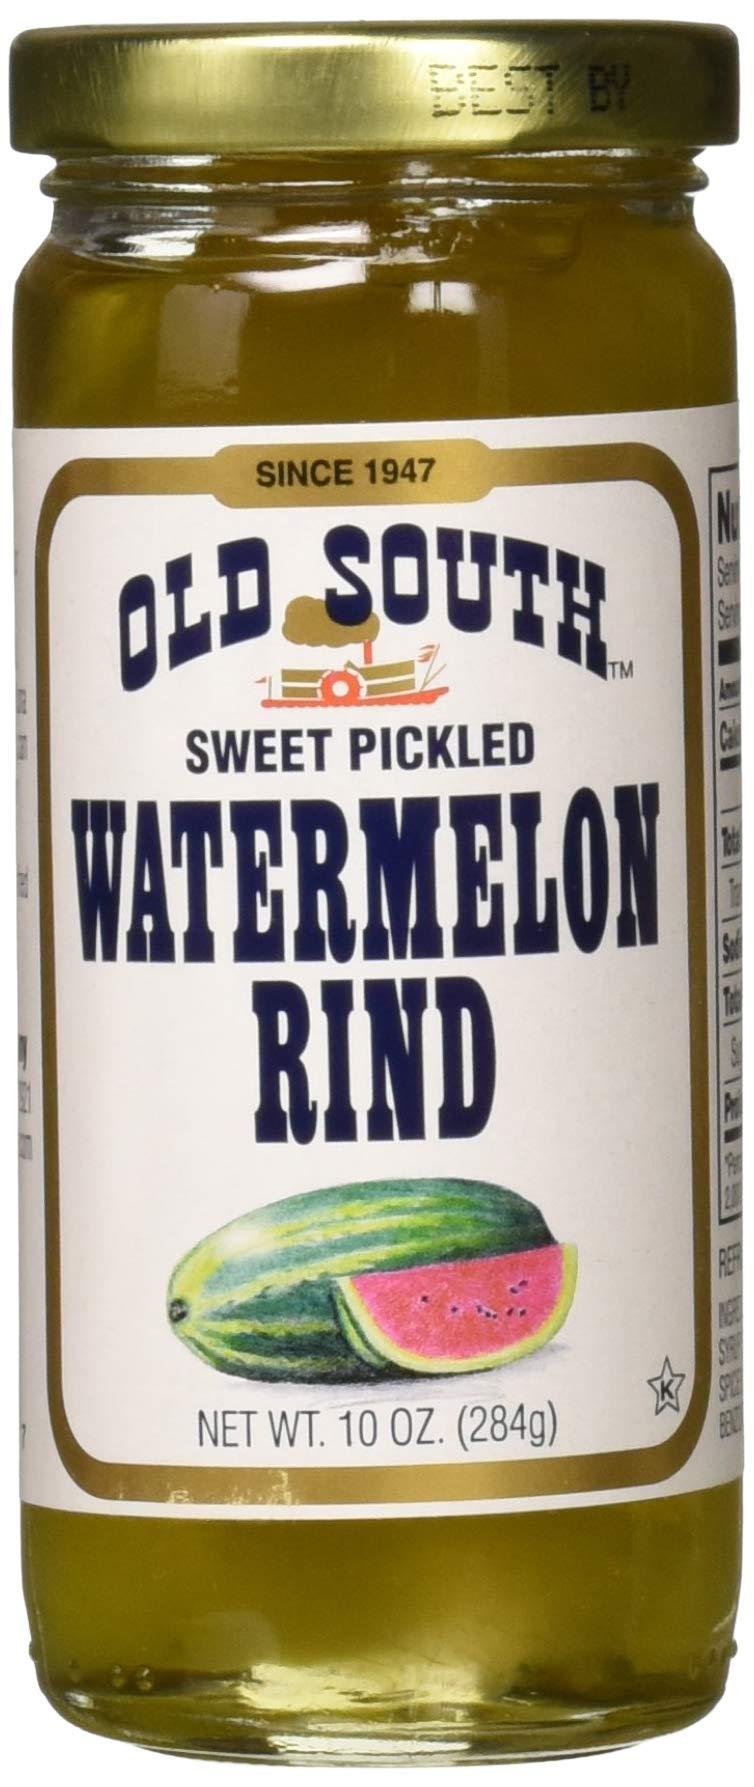 Old South Sweet Pickled Watermelon Rind 10 oz Jar (6 Pack)